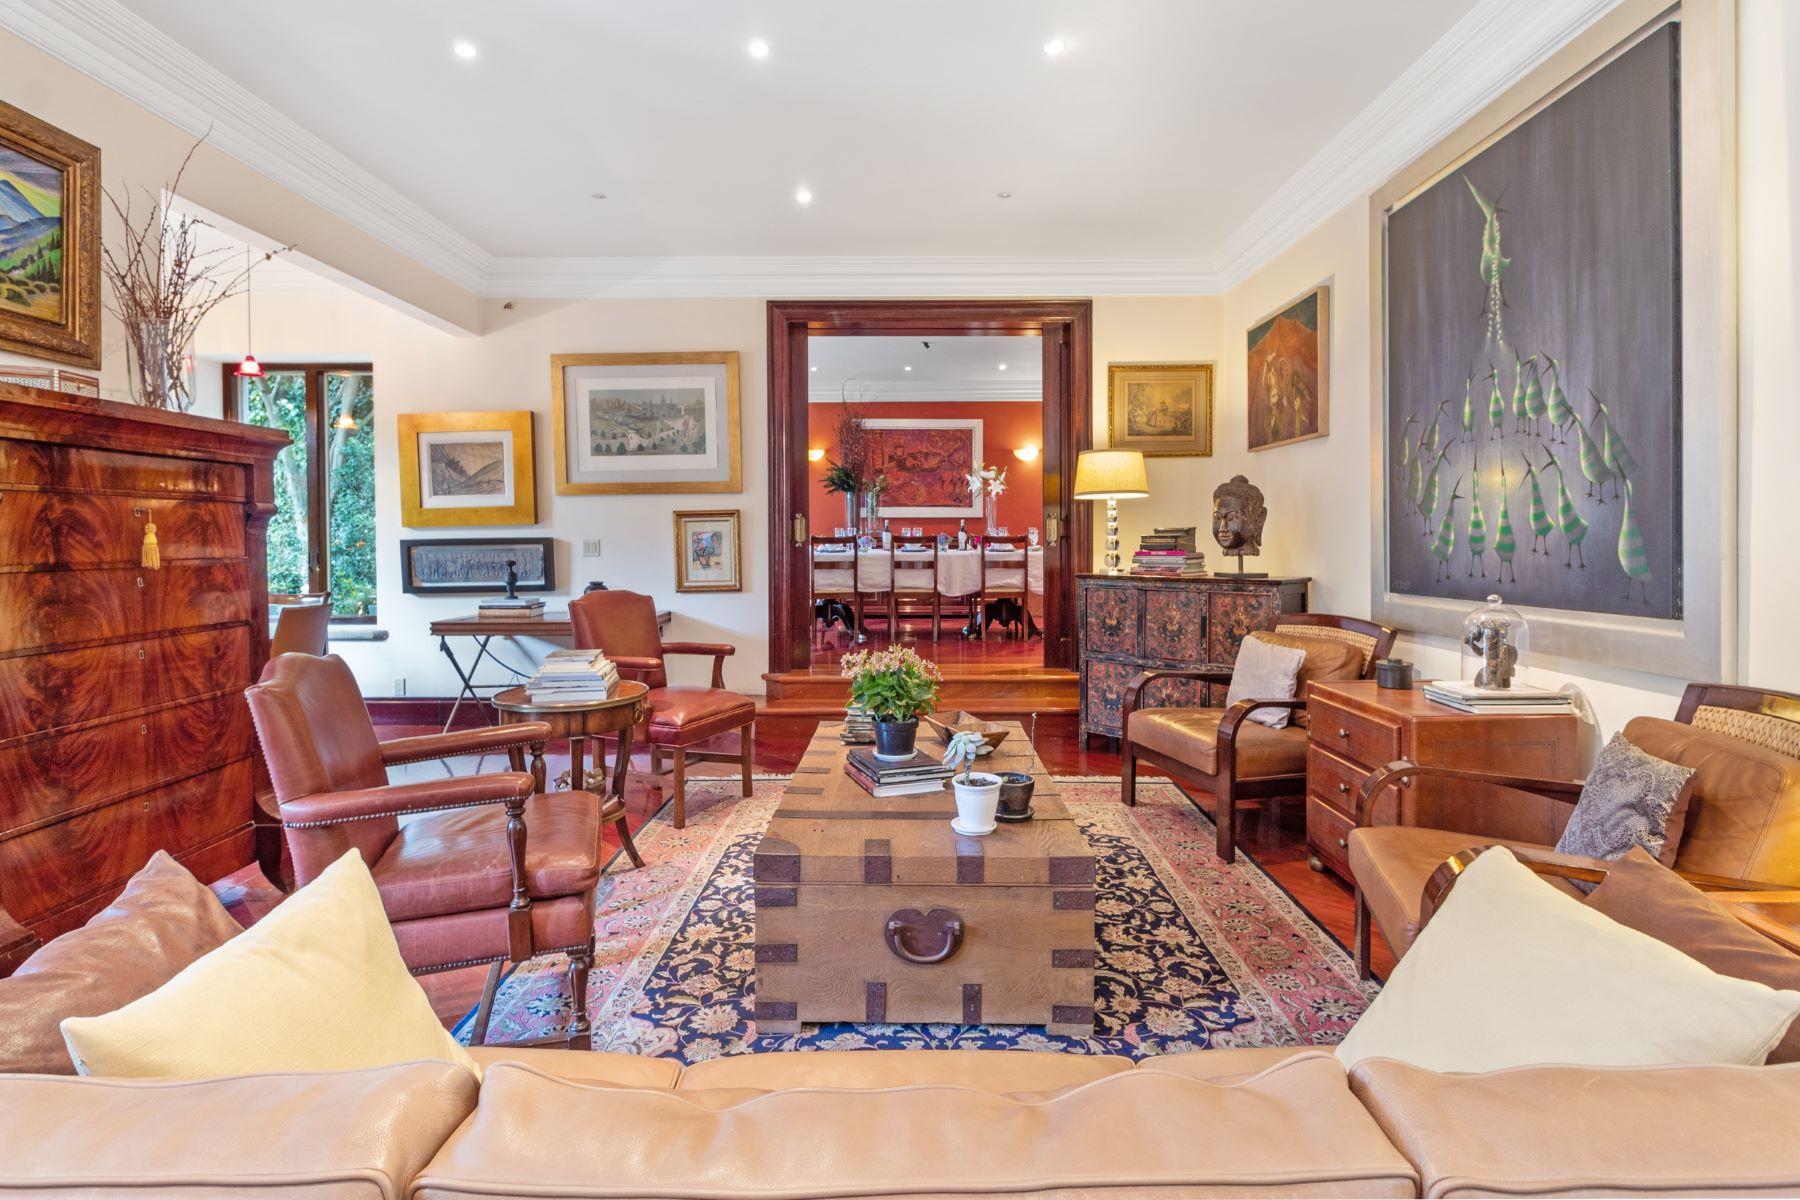 Other Residential Homes 용 매매 에 Casa Lila Lomas De Chapultepec, 멕시코의 도시 52785 멕시코